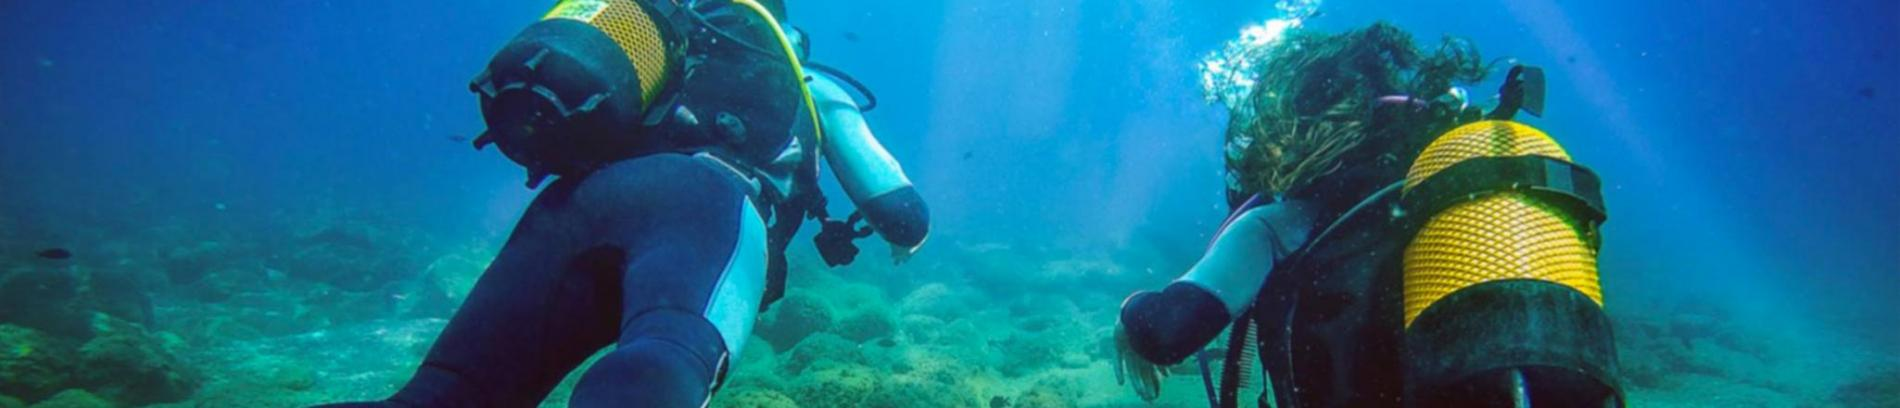 Slide les fonds marins